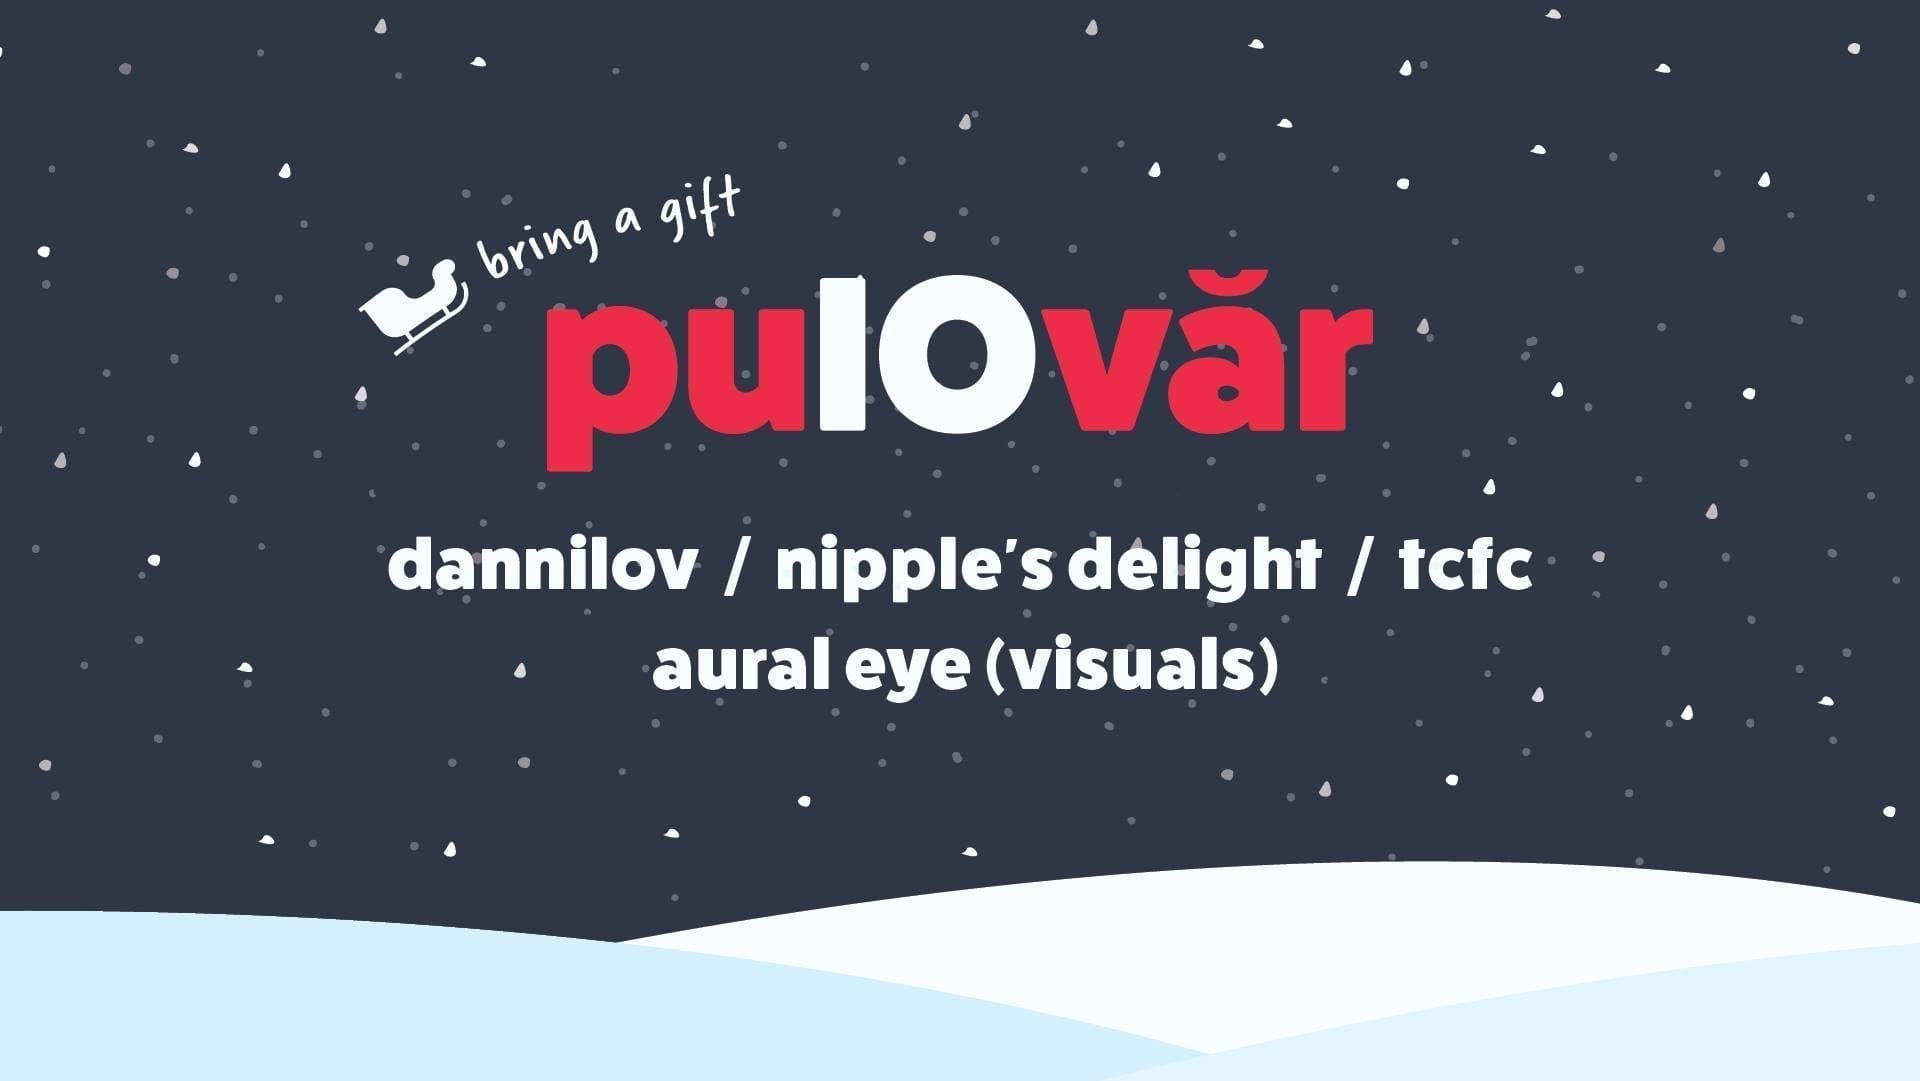 Pulovăr 10 - for the selfless selfish